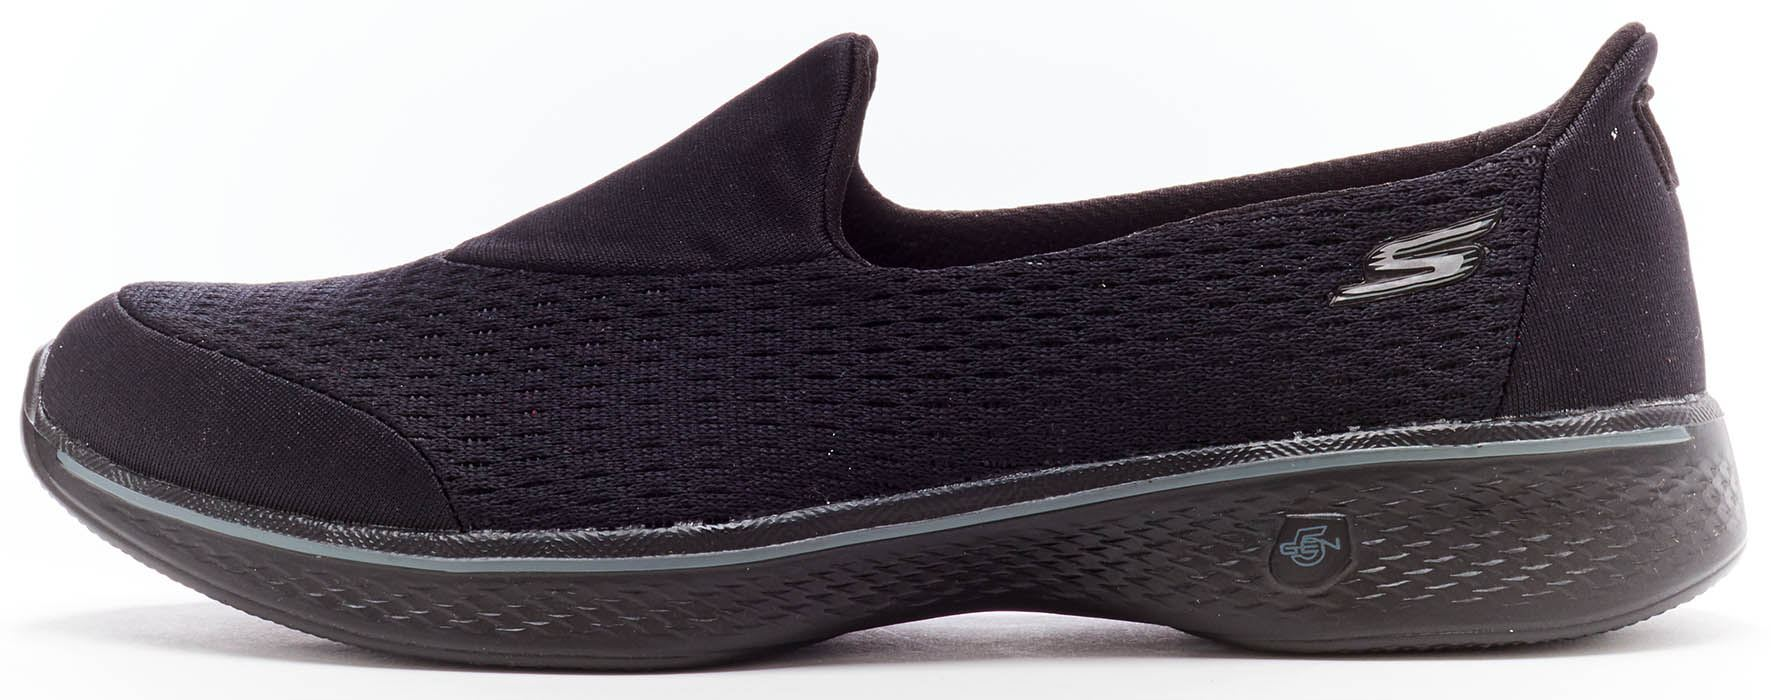 Black 'Go Walk 4 Pursuit' slip on trainers cheap reliable outlet deals sale get authentic cheap looking for SPoRoUw7